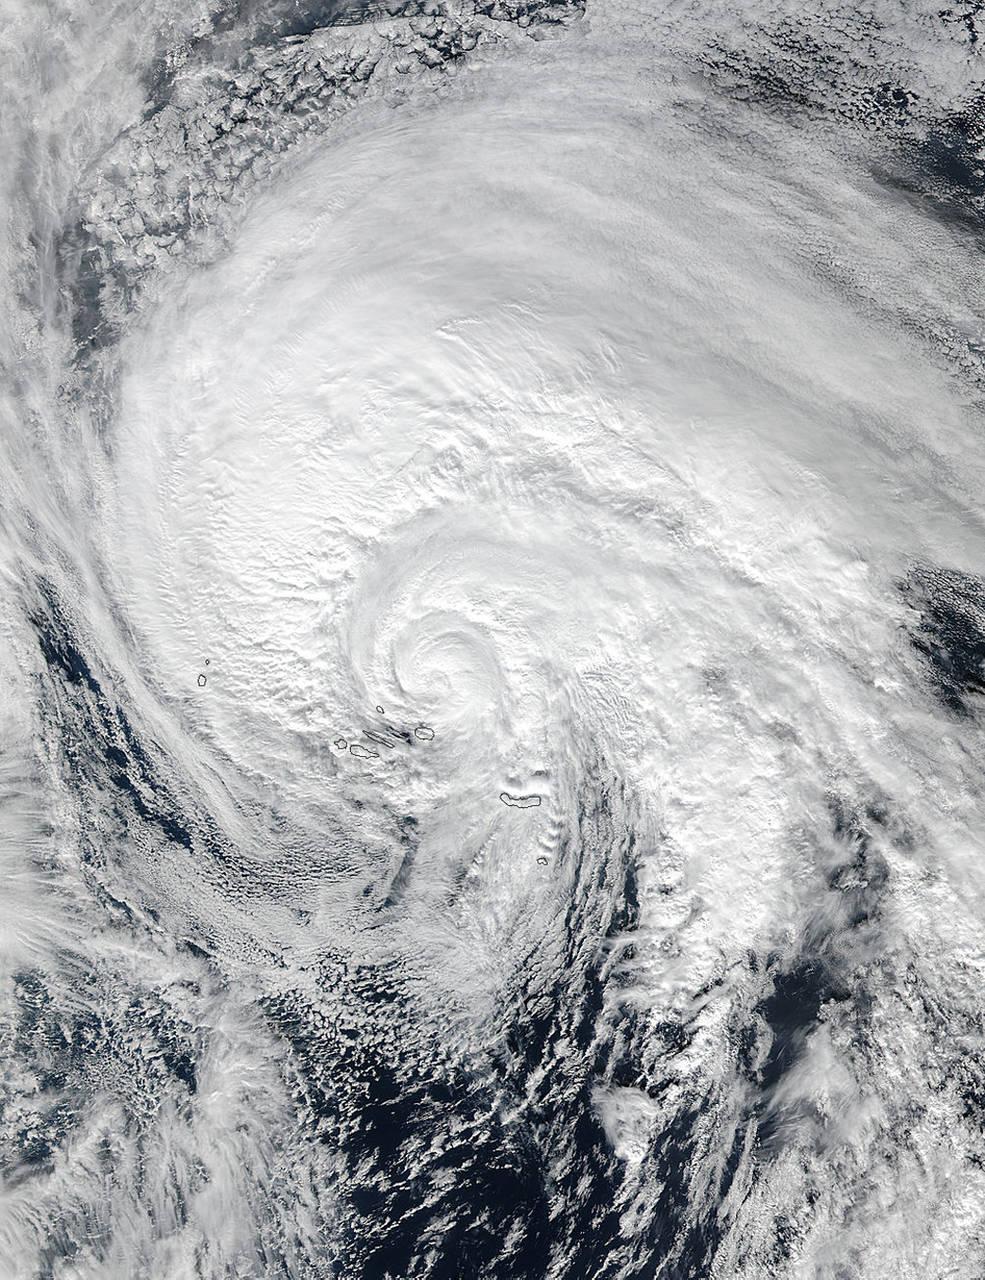 Visible look at Hurricane Alex